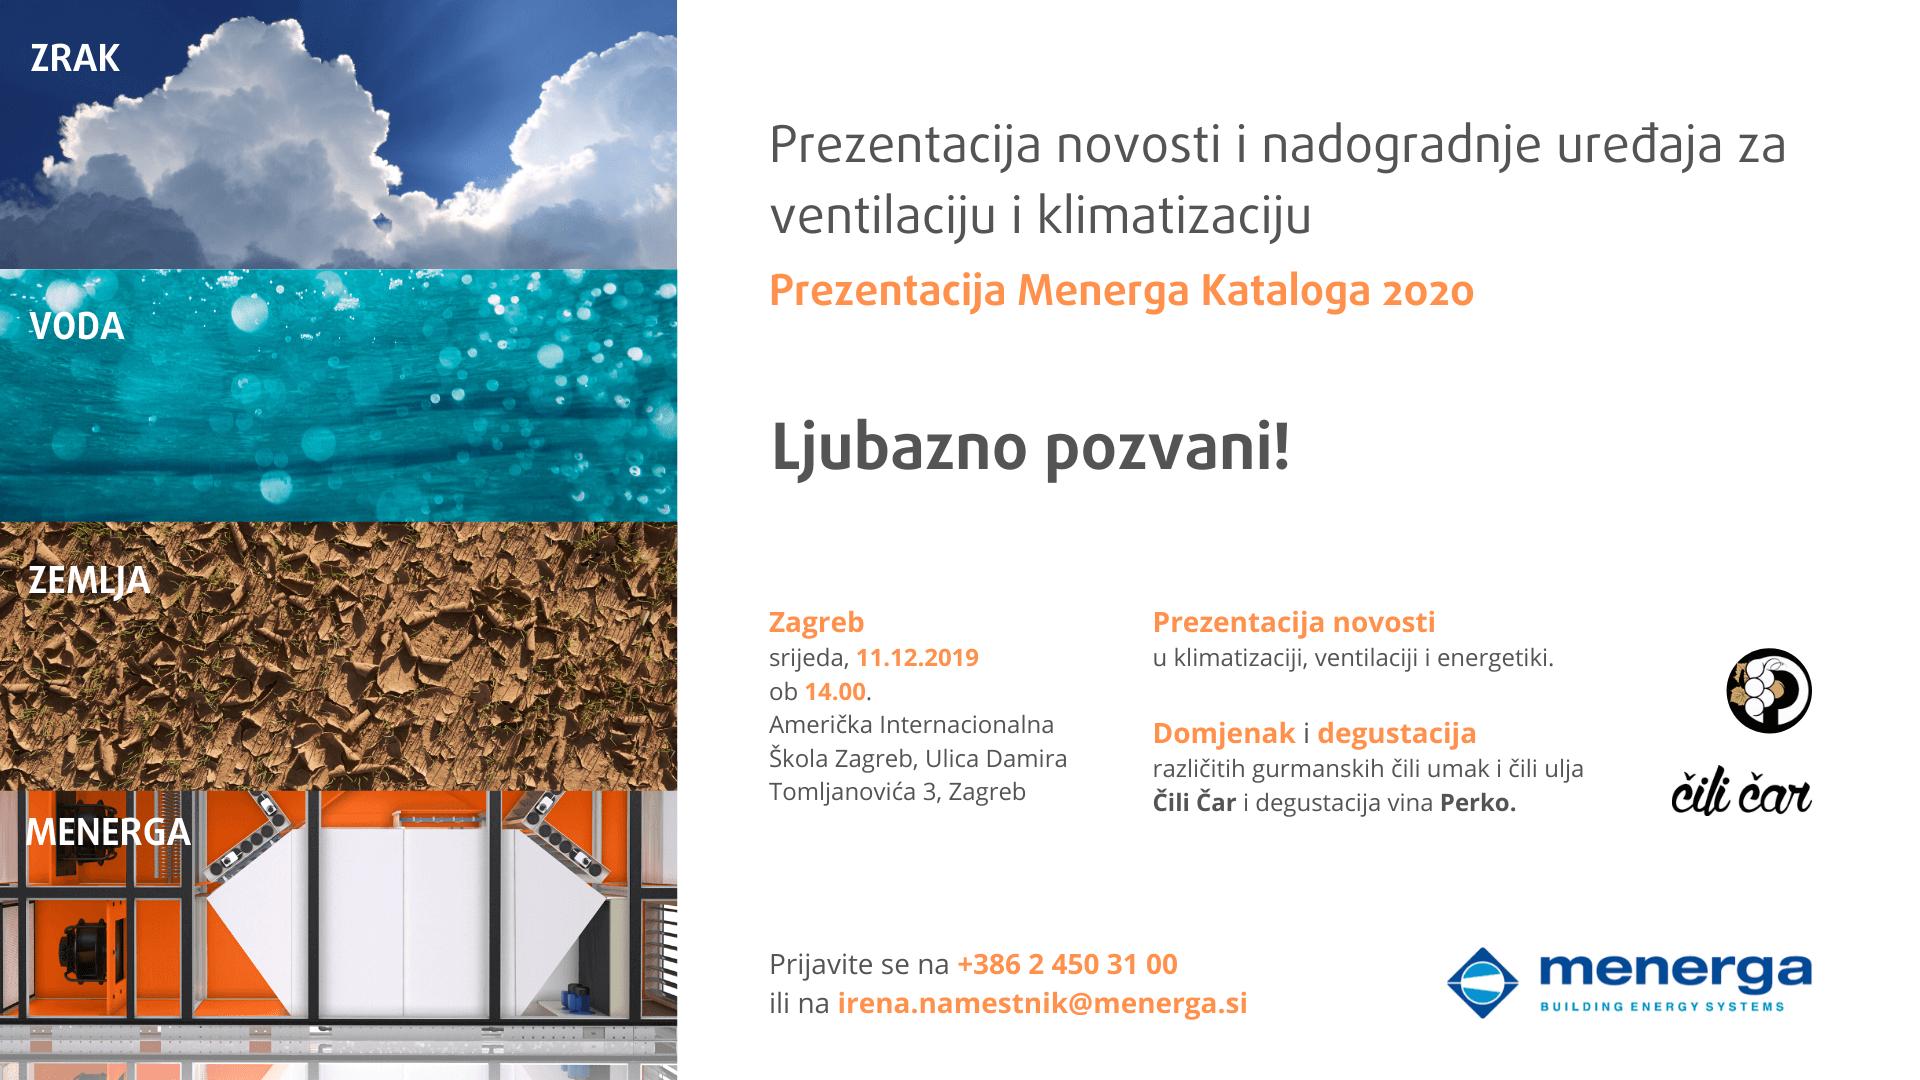 HR_pozivnica_Menerga katalog 2020_Zagreb